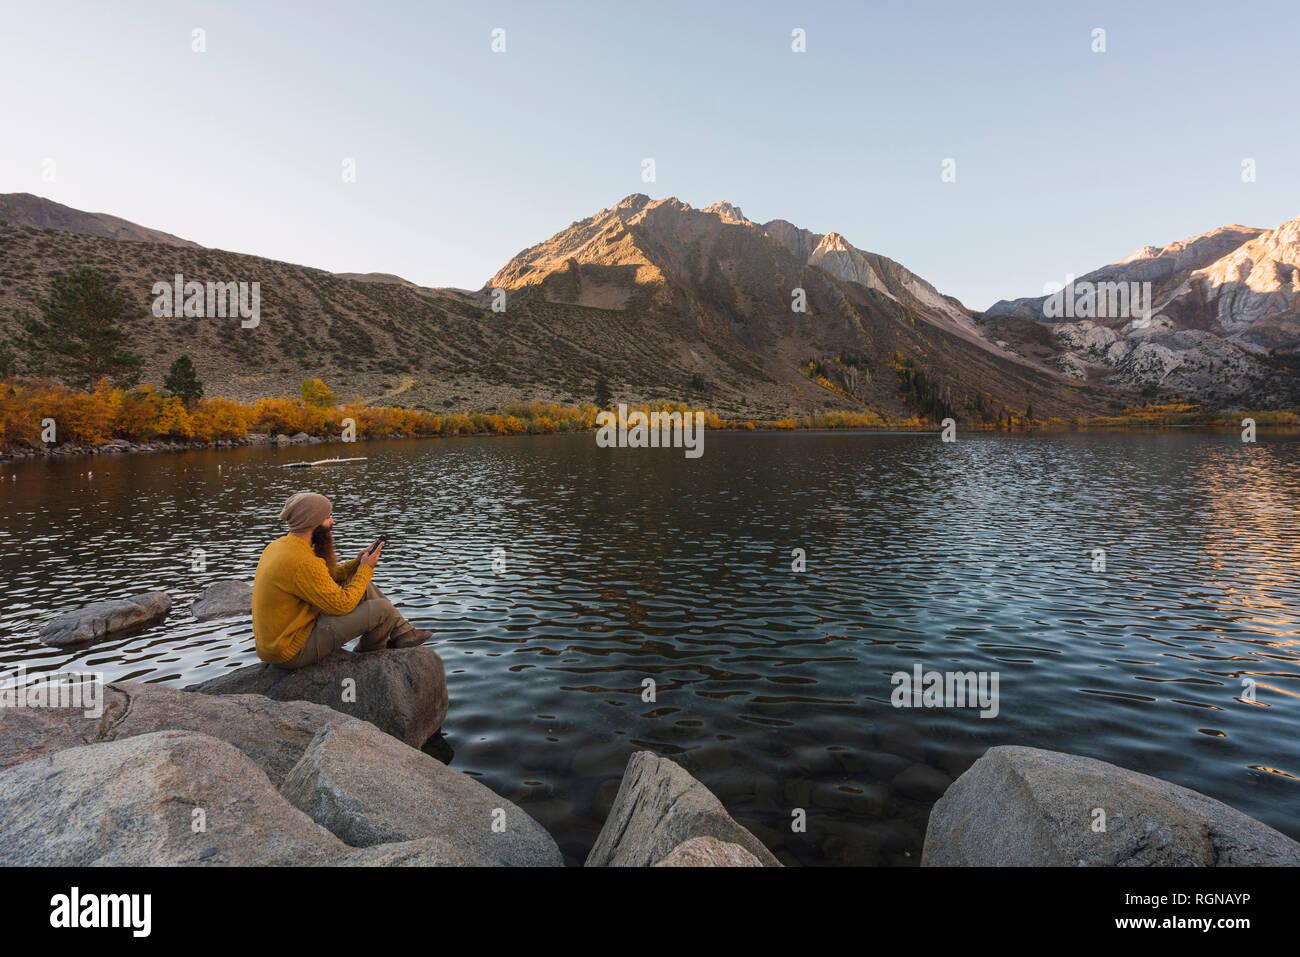 USA, California, Yosemite National Park, Mammoth lakes, hiker using smartphone at Convict Lake - Stock Image